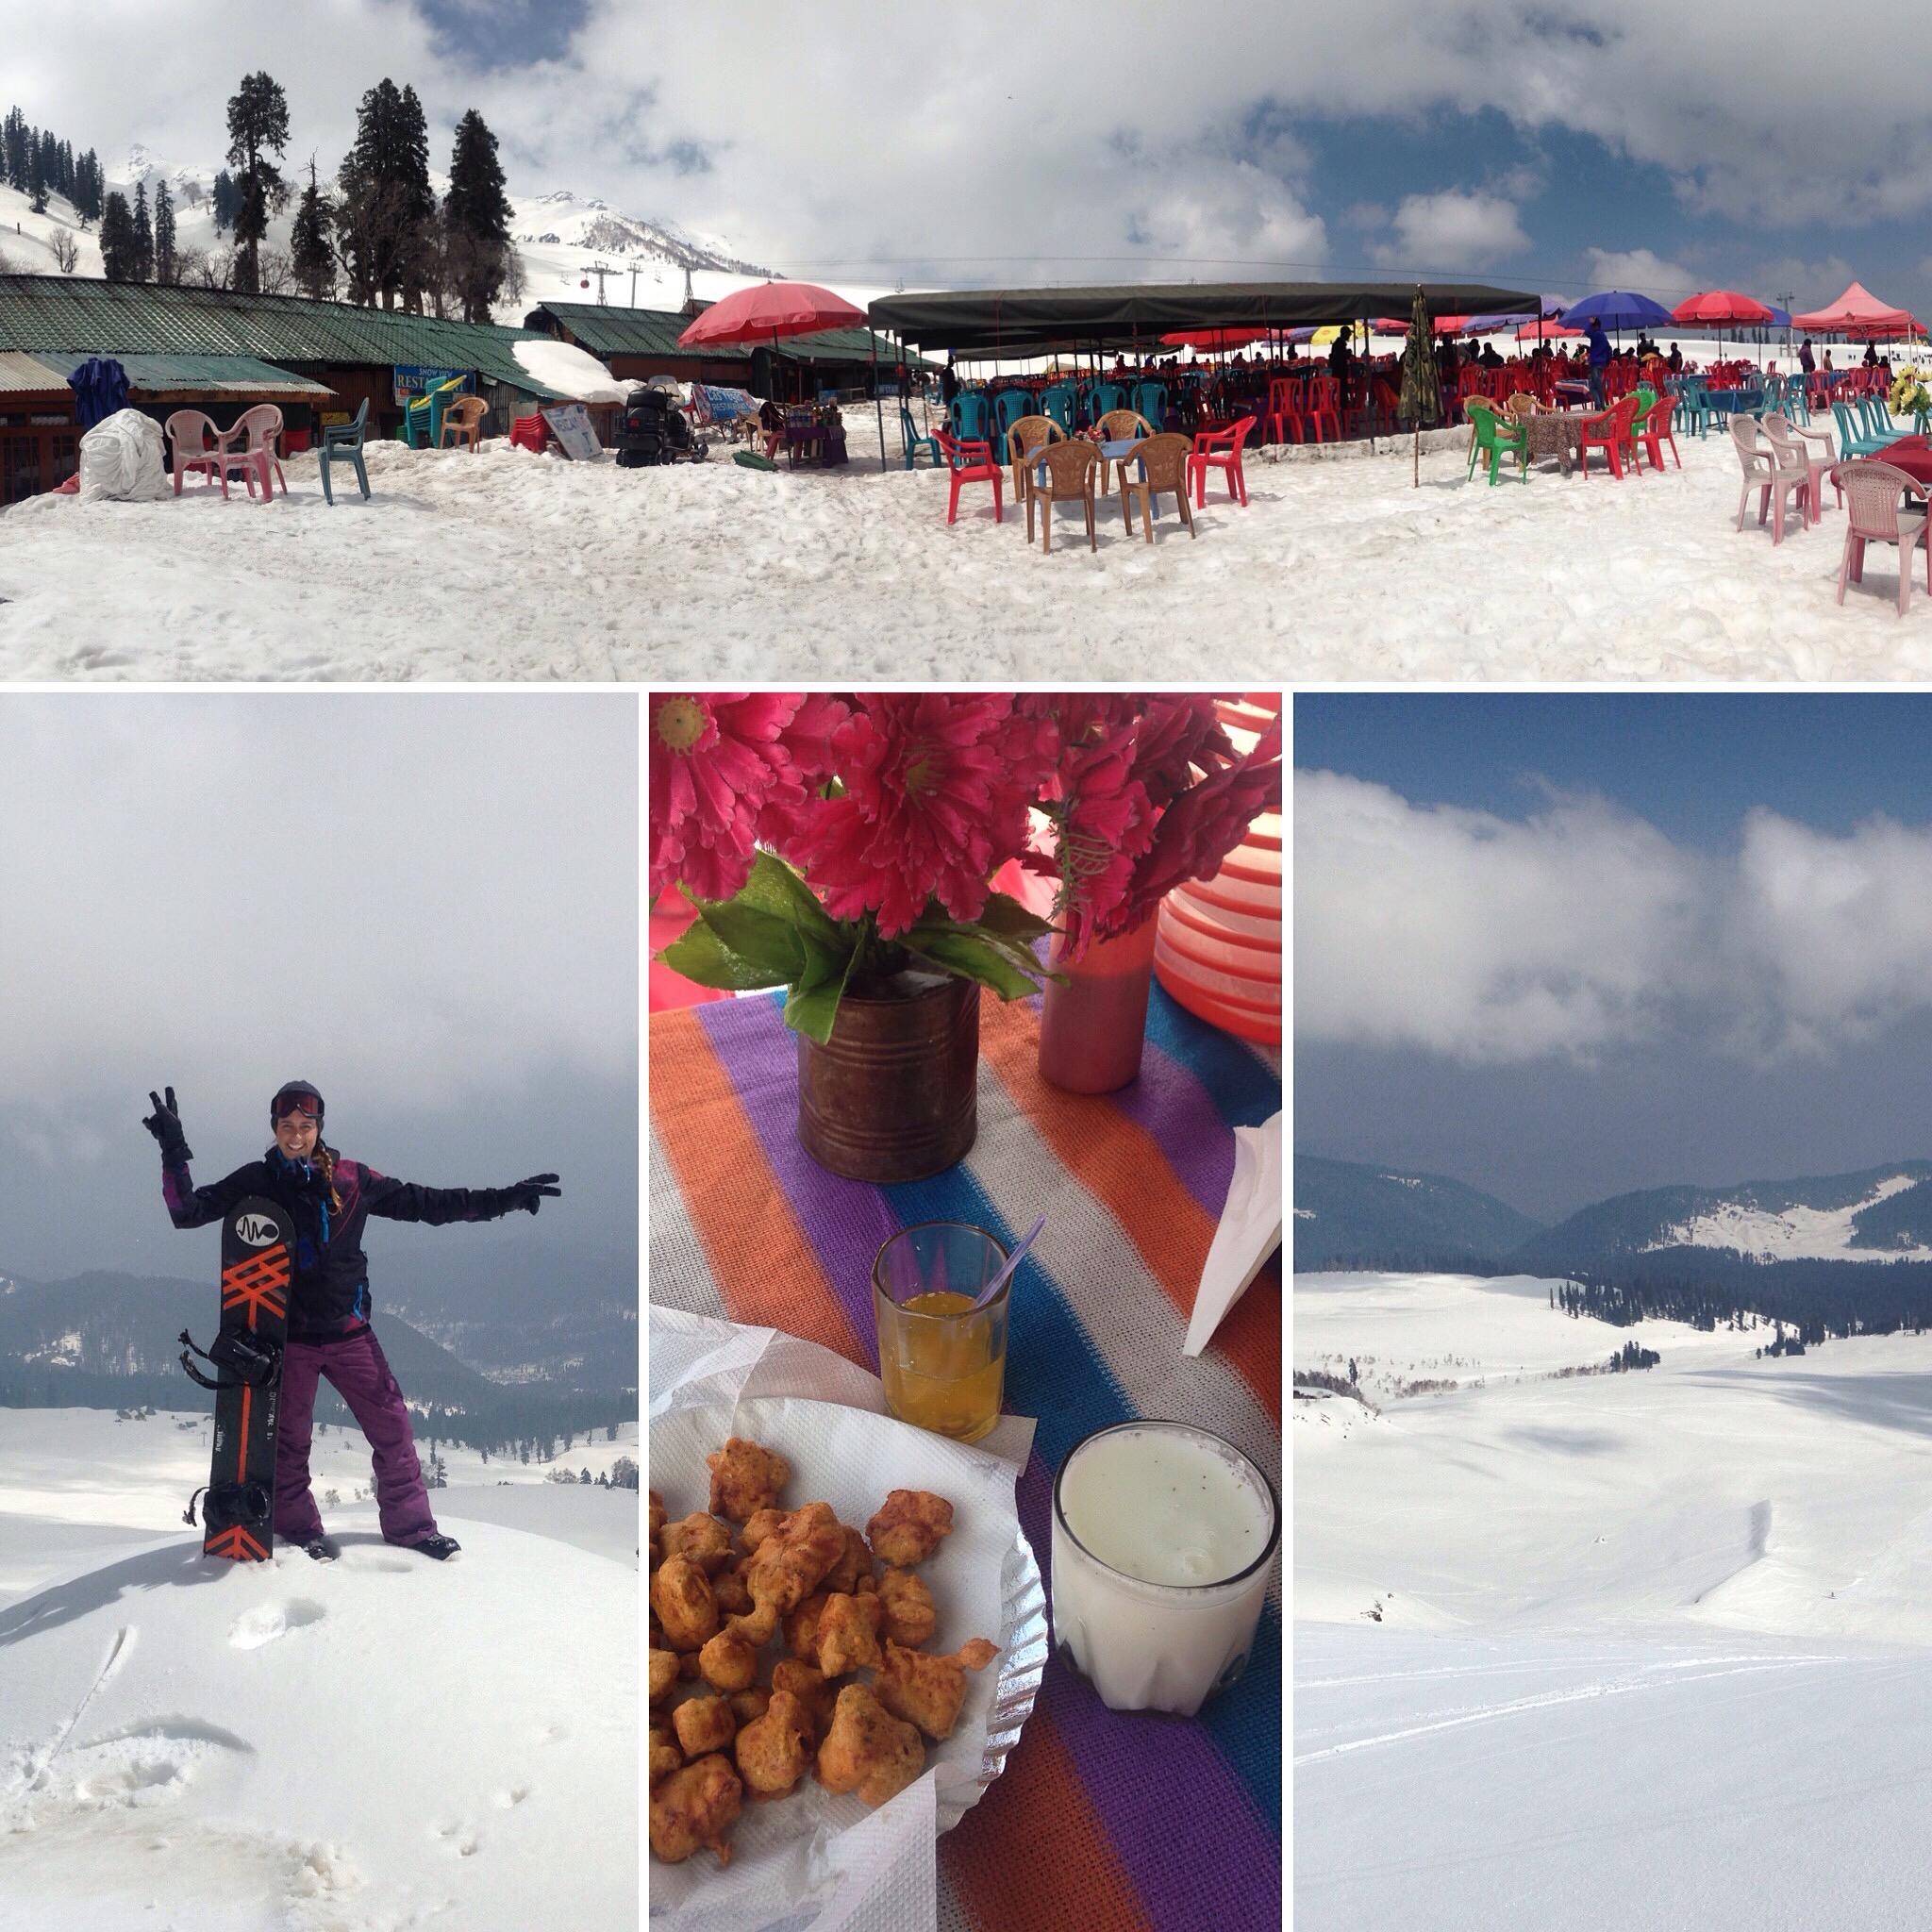 Snowboarding off the world's highest gondola @ 4,100 metres (13,500 feet) on Kongdori Mountain. Gulmarg Resort (Kongdoori-Aferwat), Gulmarg, Kashmir, Himalayas.